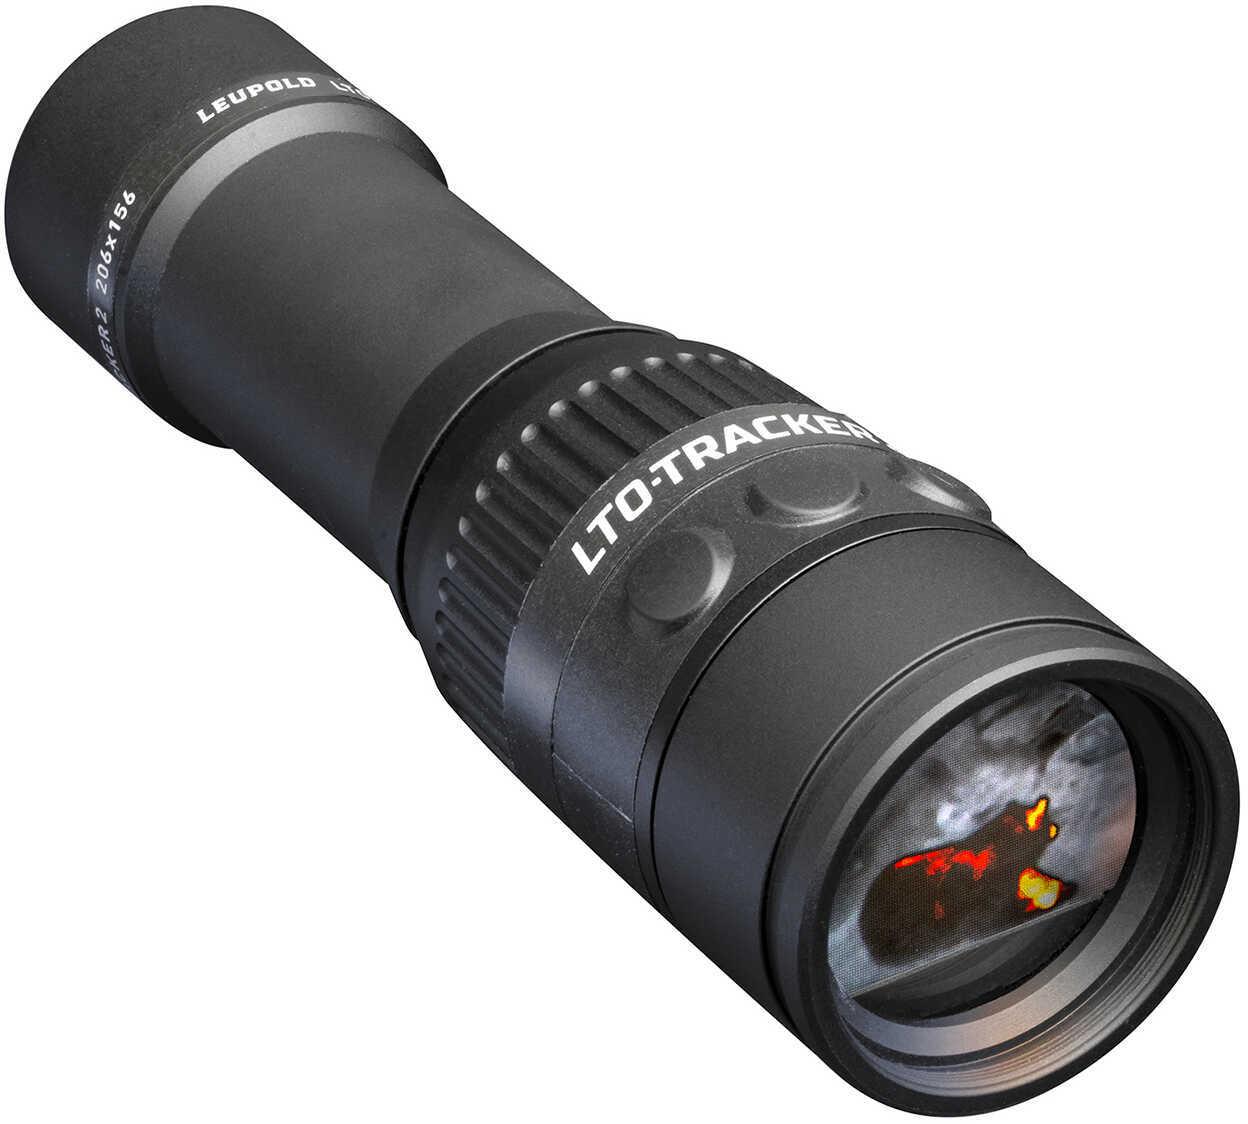 Leupold LTO-Tracker 2 Thermal Imager 7X Matte Finish 177188